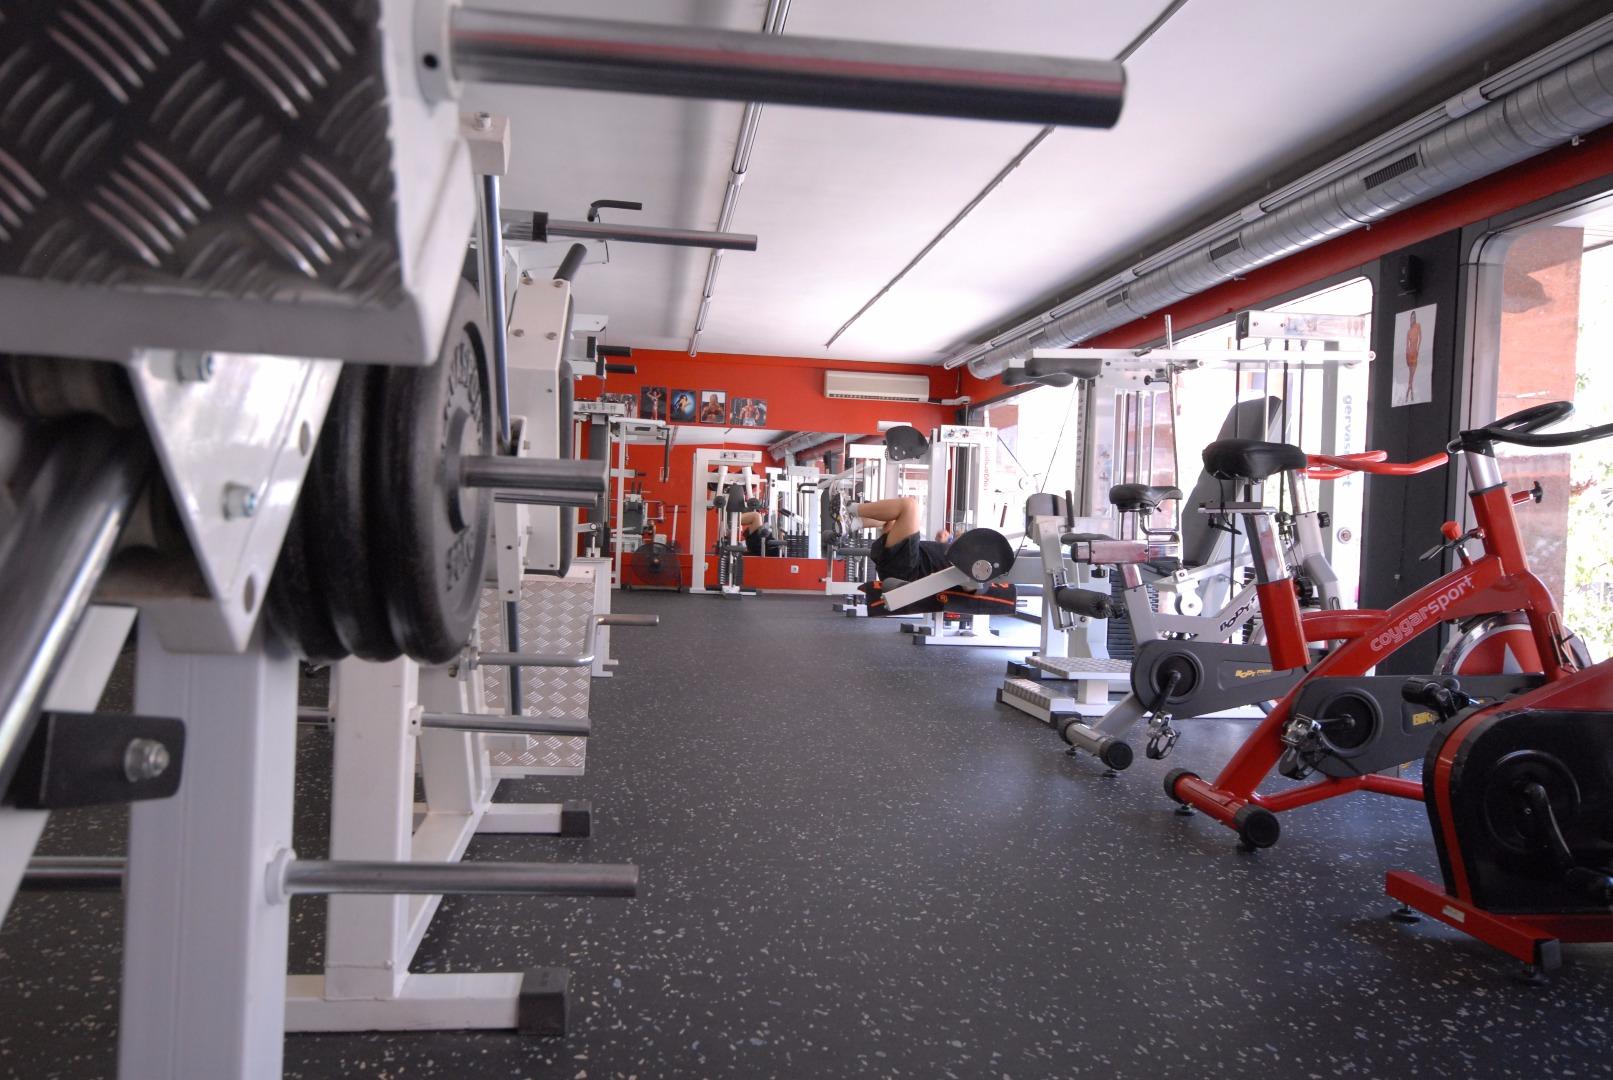 Oferta gimnasio puro impacto barcelona gymforless for Gimnasio barcelona